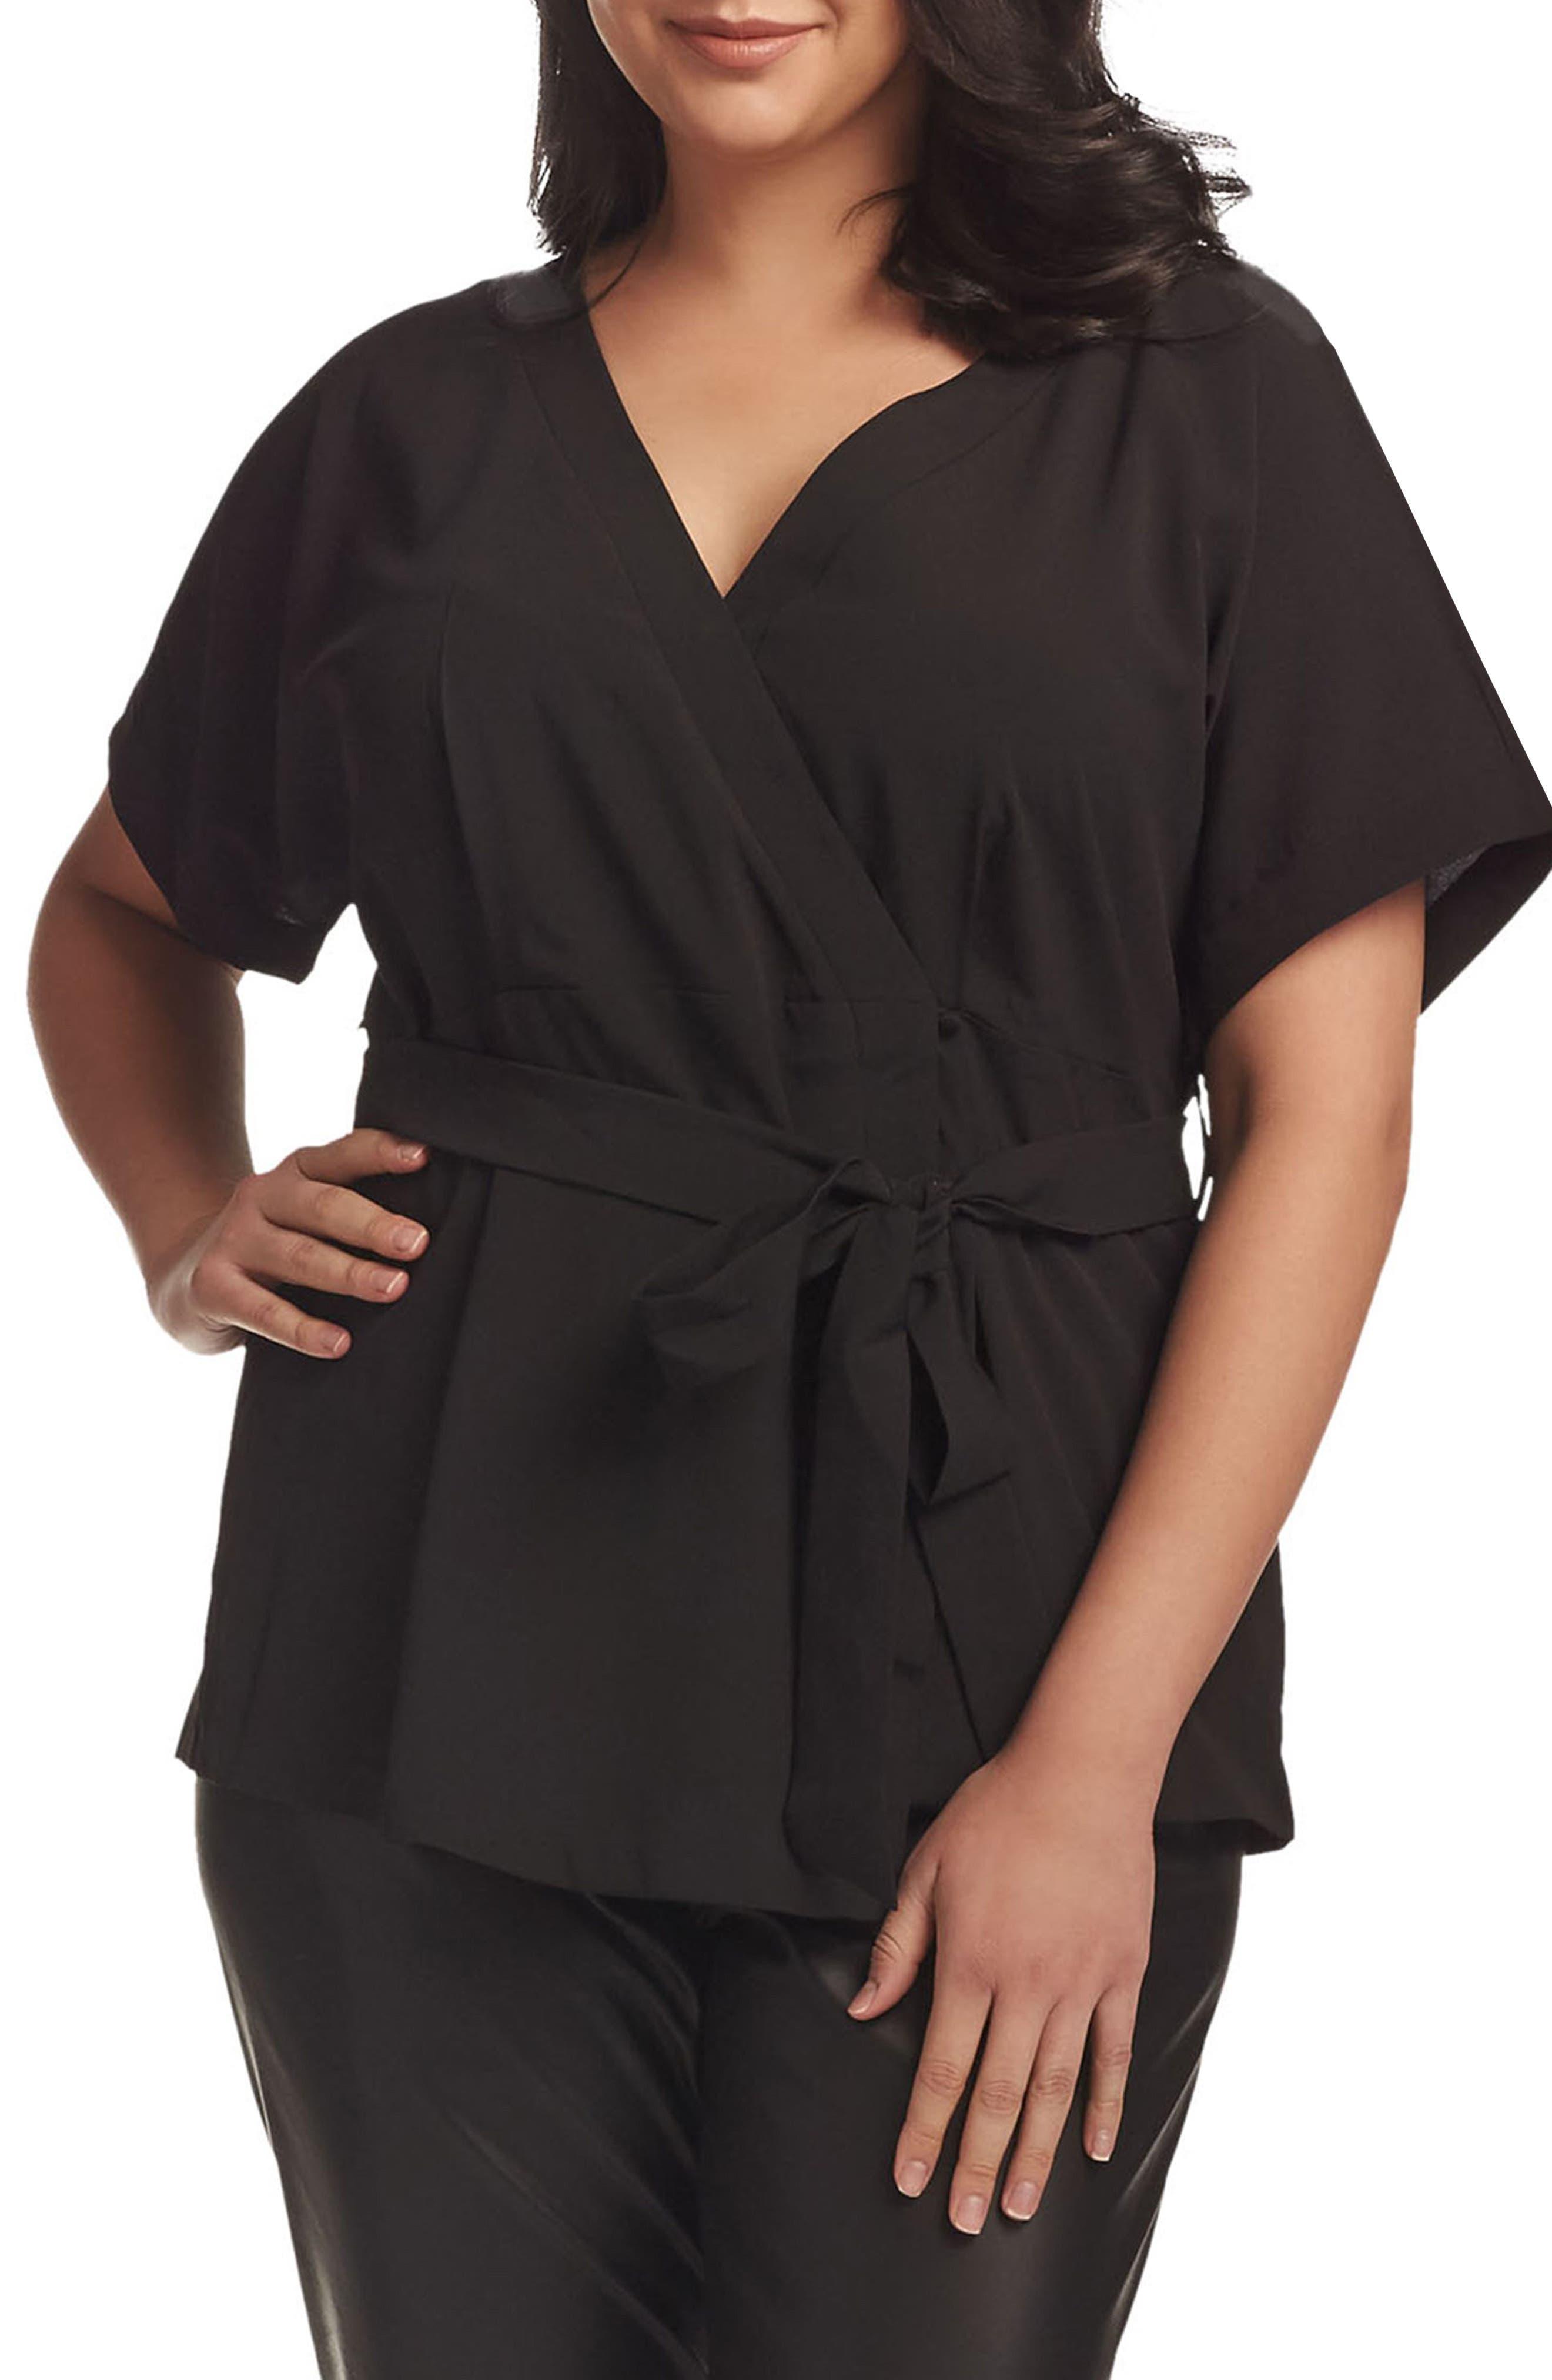 Ann Wrap Top,                         Main,                         color, Black